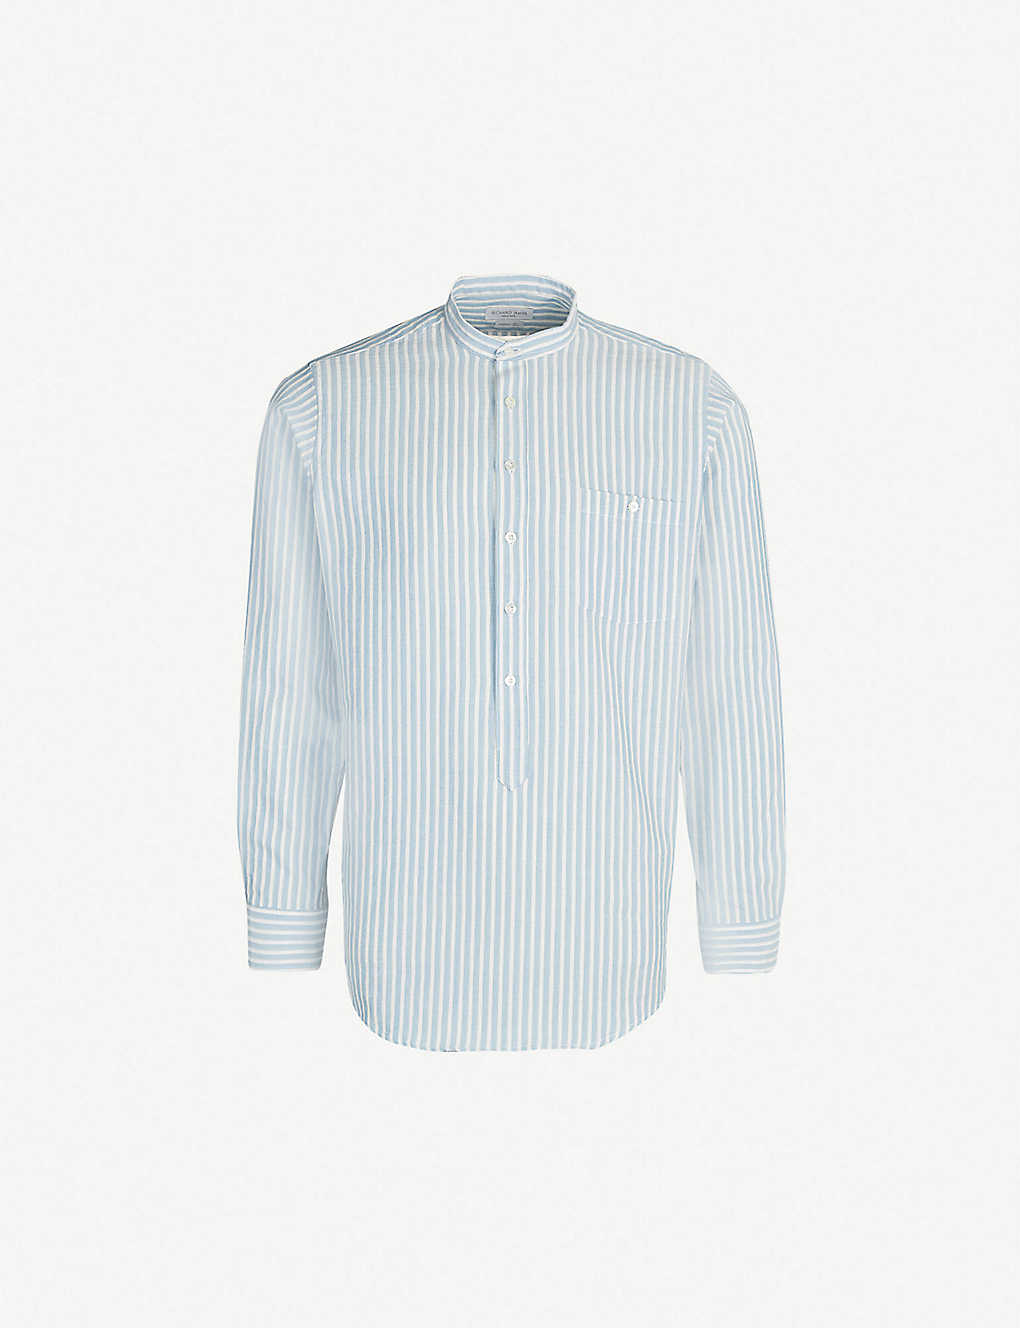 52f5d8c527 RICHARD JAMES - Striped classic-fit cotton and linen-blend shirt ...